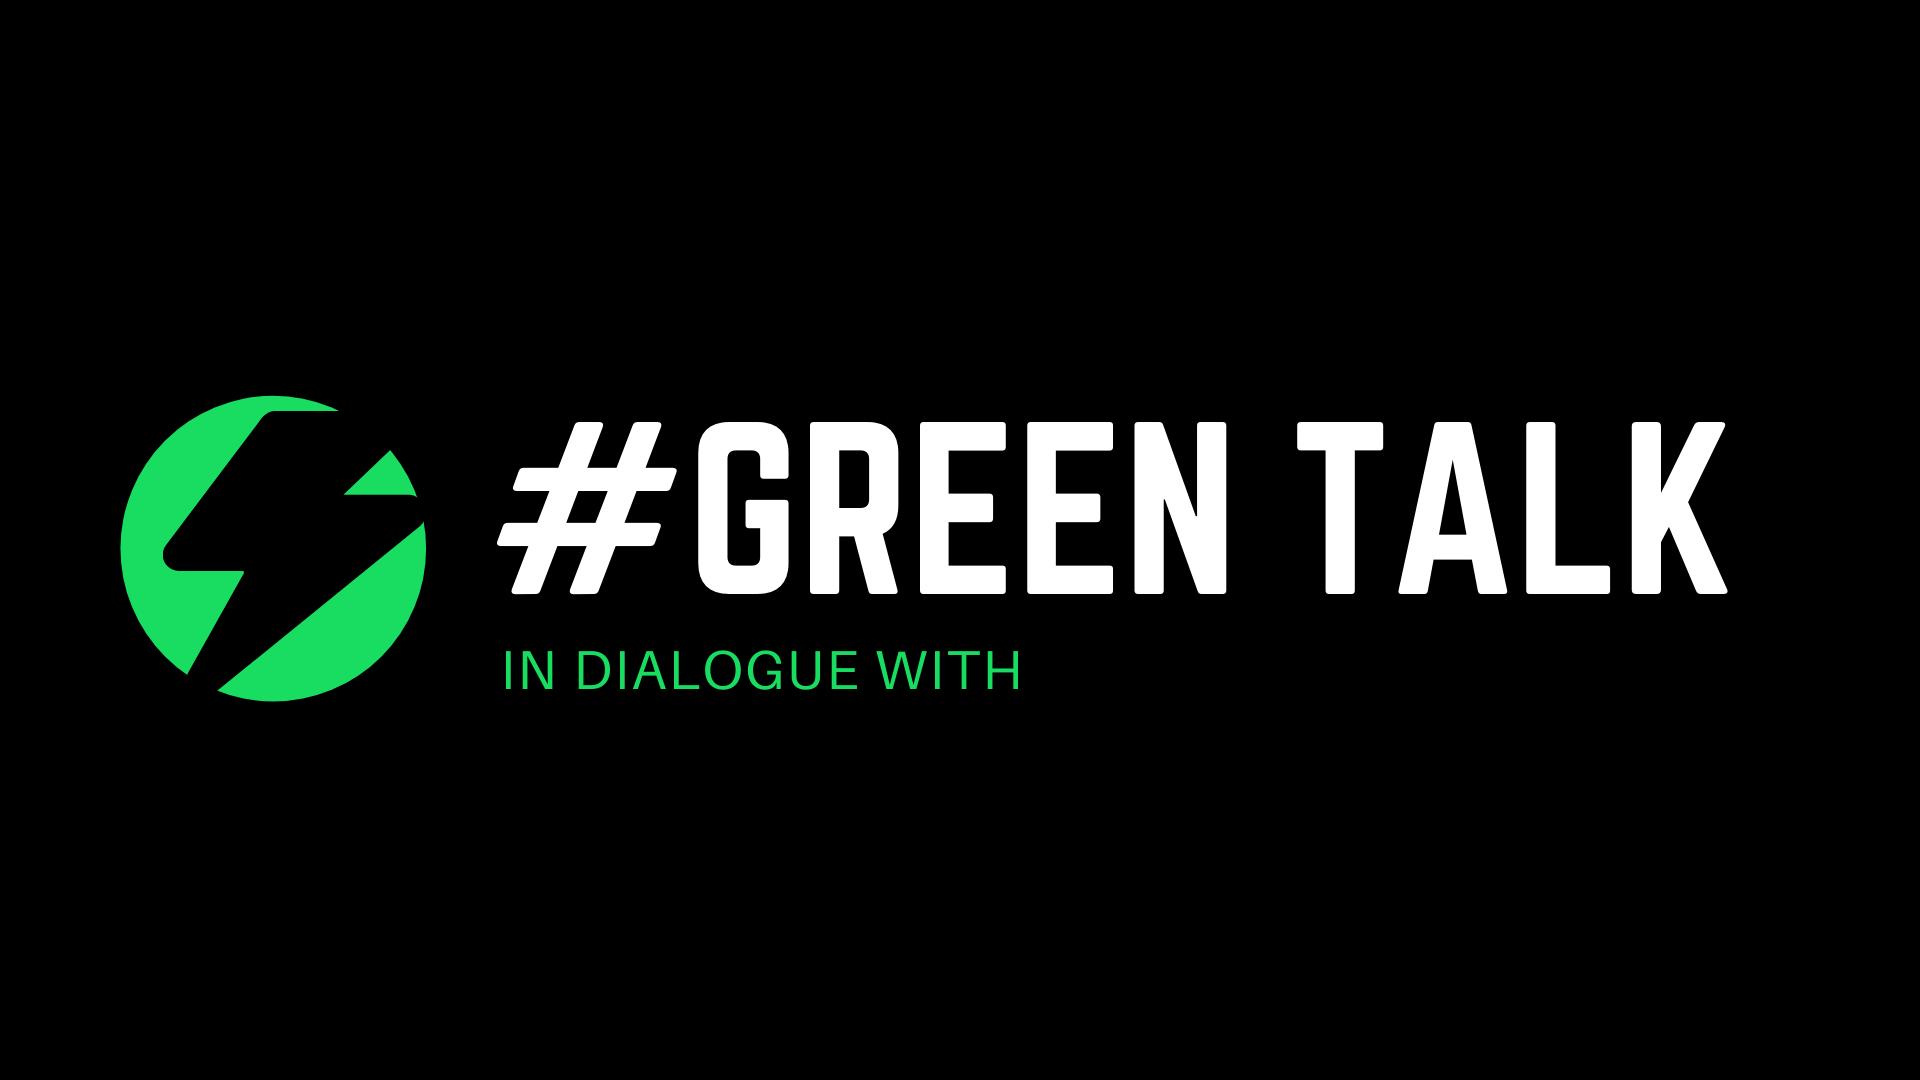 #GreenTalk